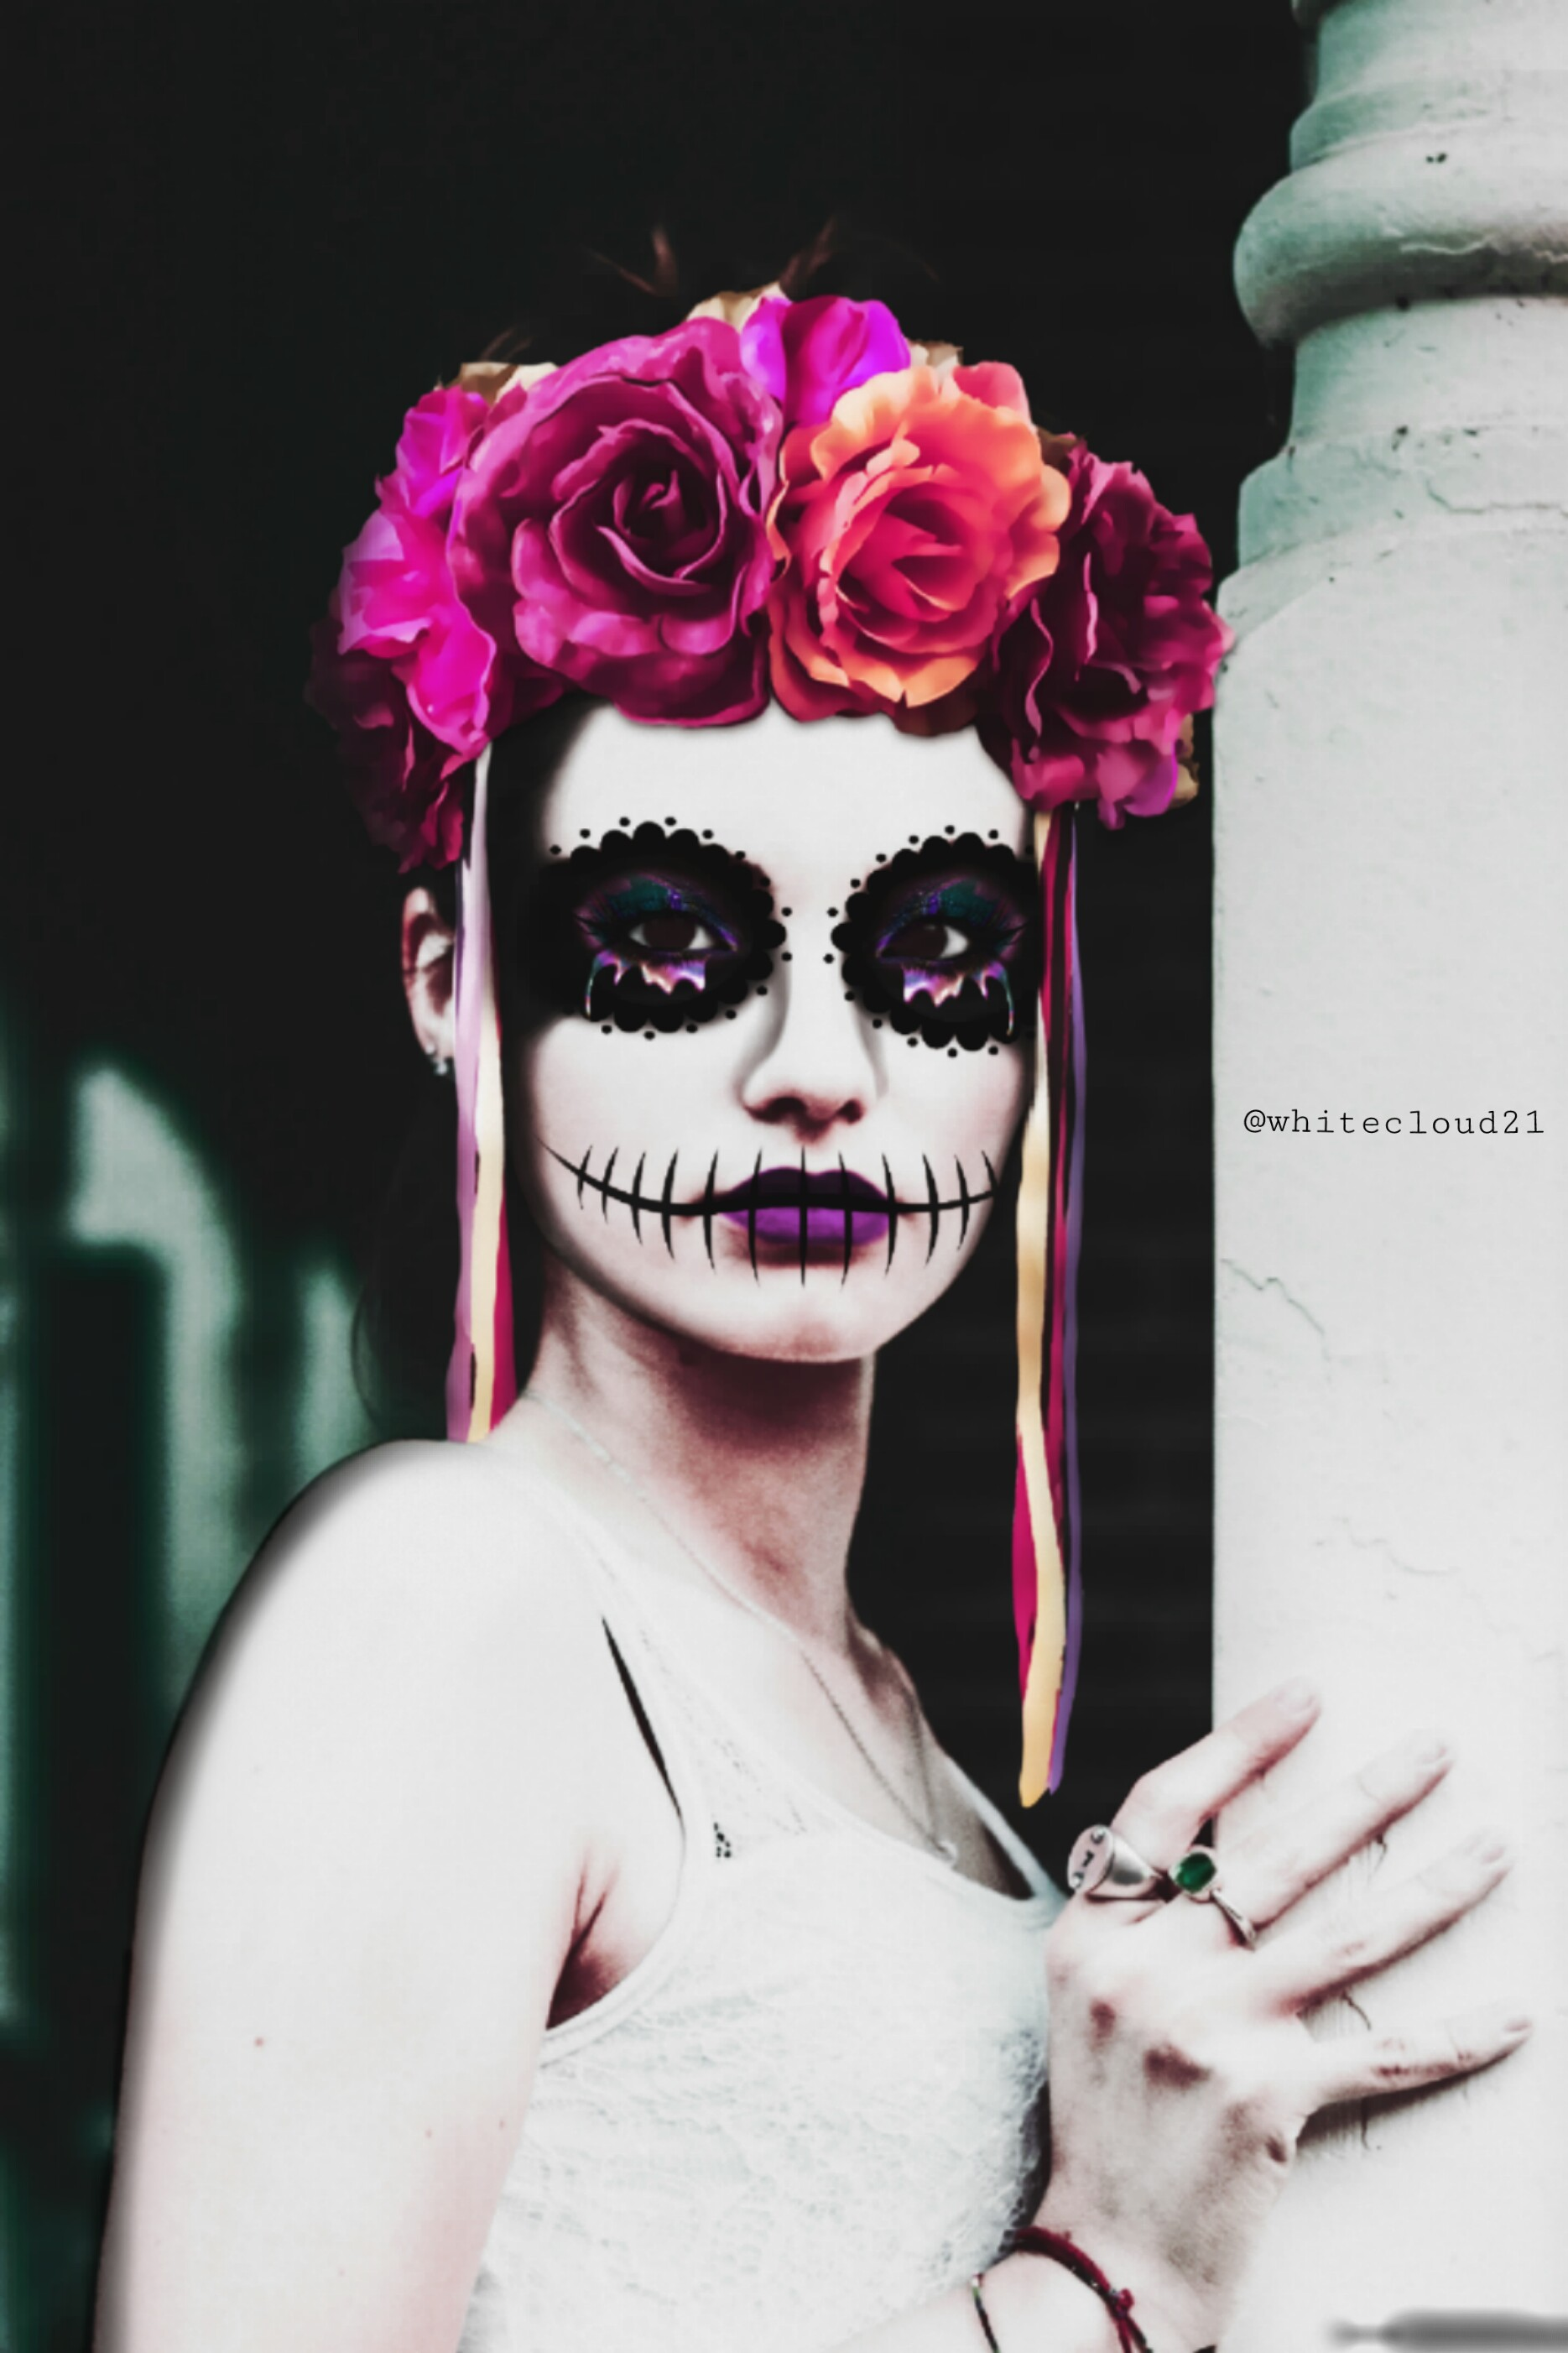 #dayofthedead #myedit #halloween #girl #madewithpicsart #madebyme